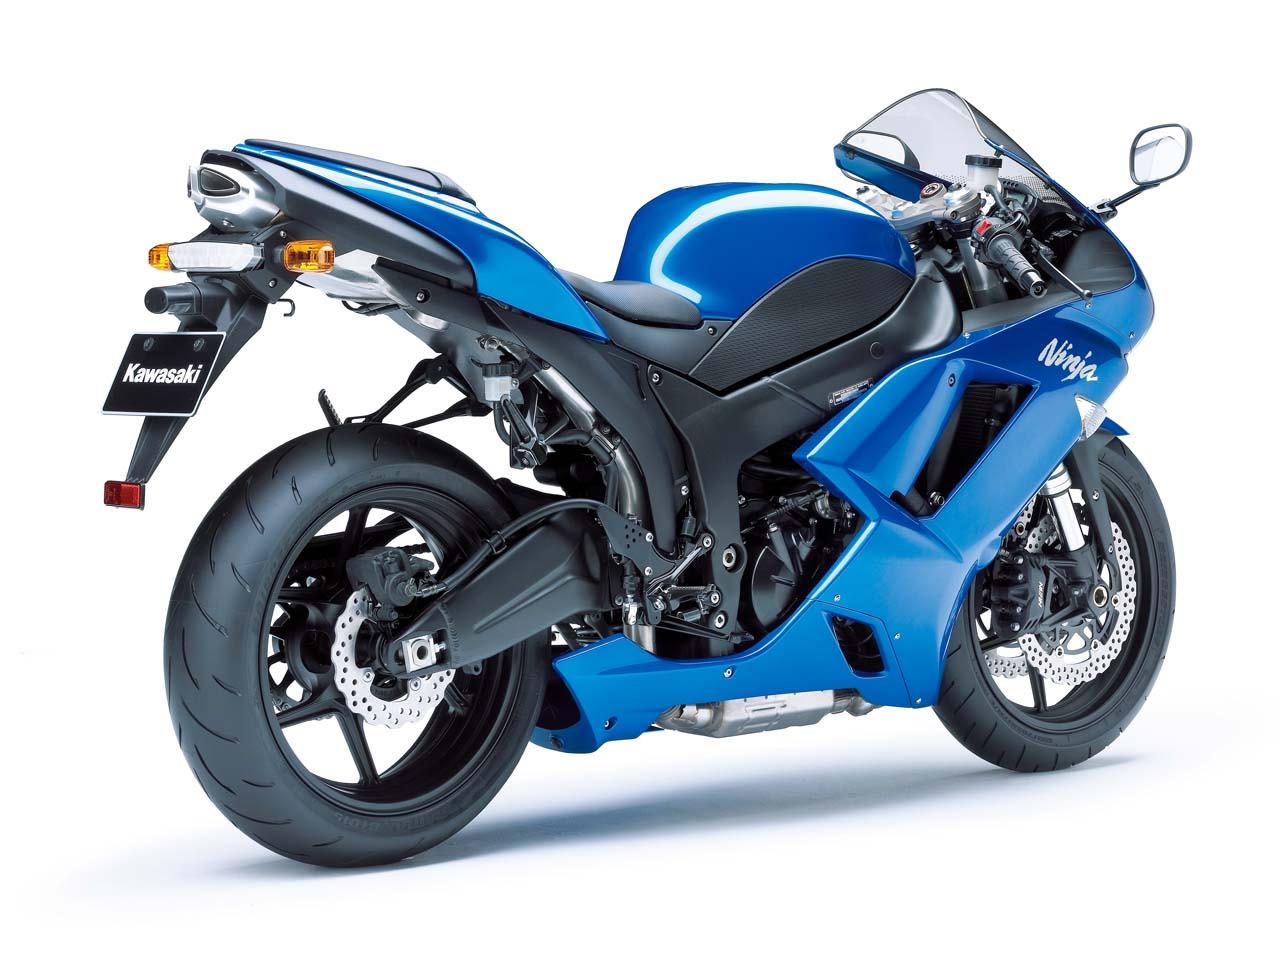 Kawasaki Ninja Motorcycle Case